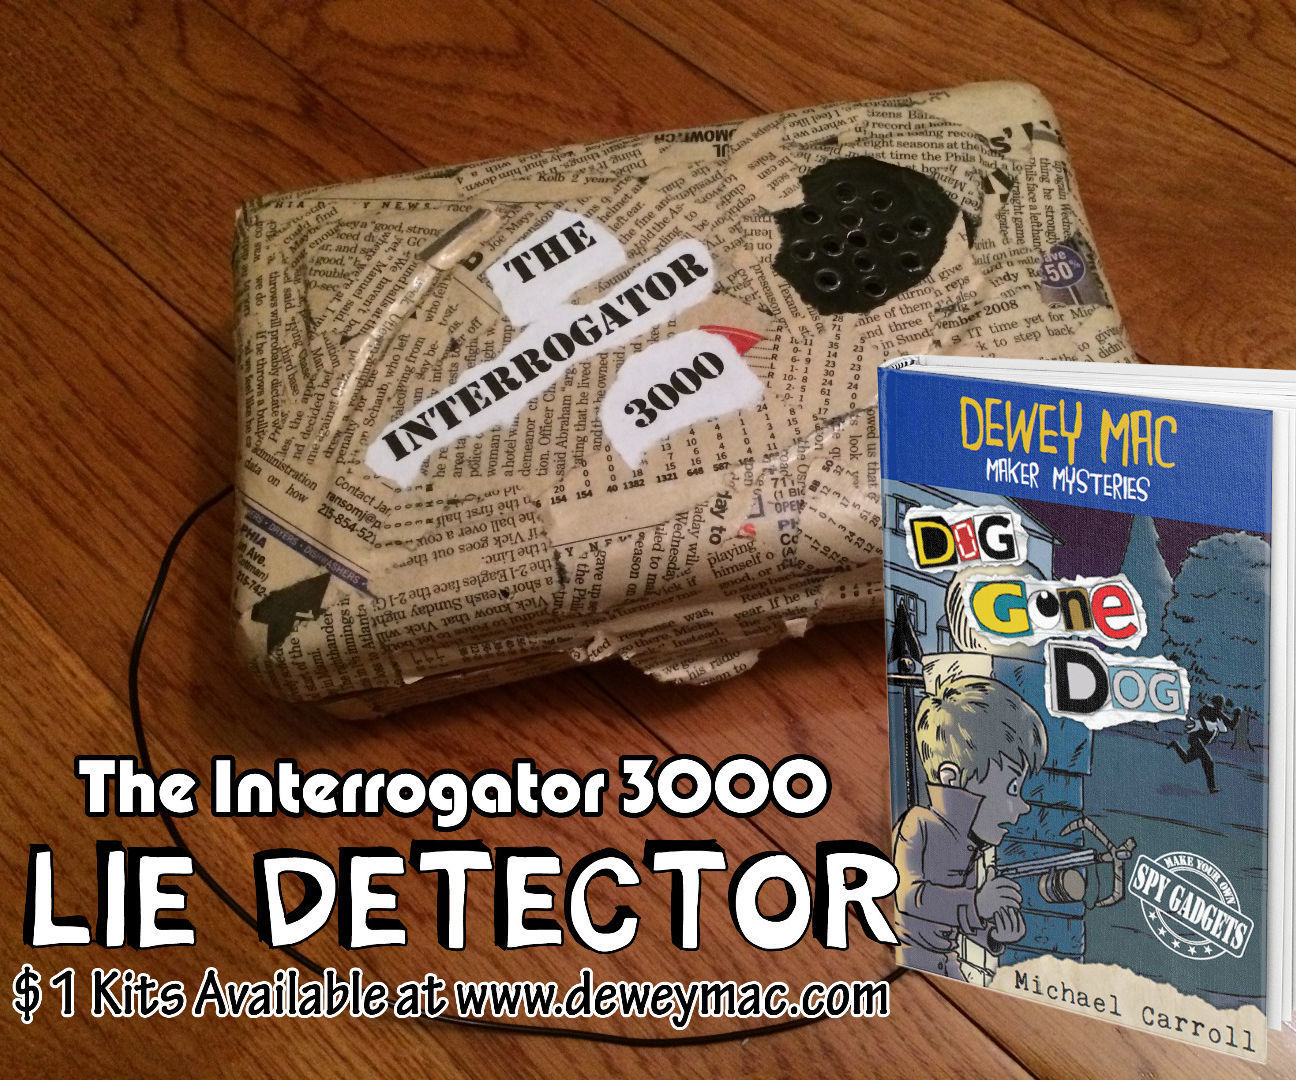 Dewey Mac's Interrogator 3000 Lie Detector